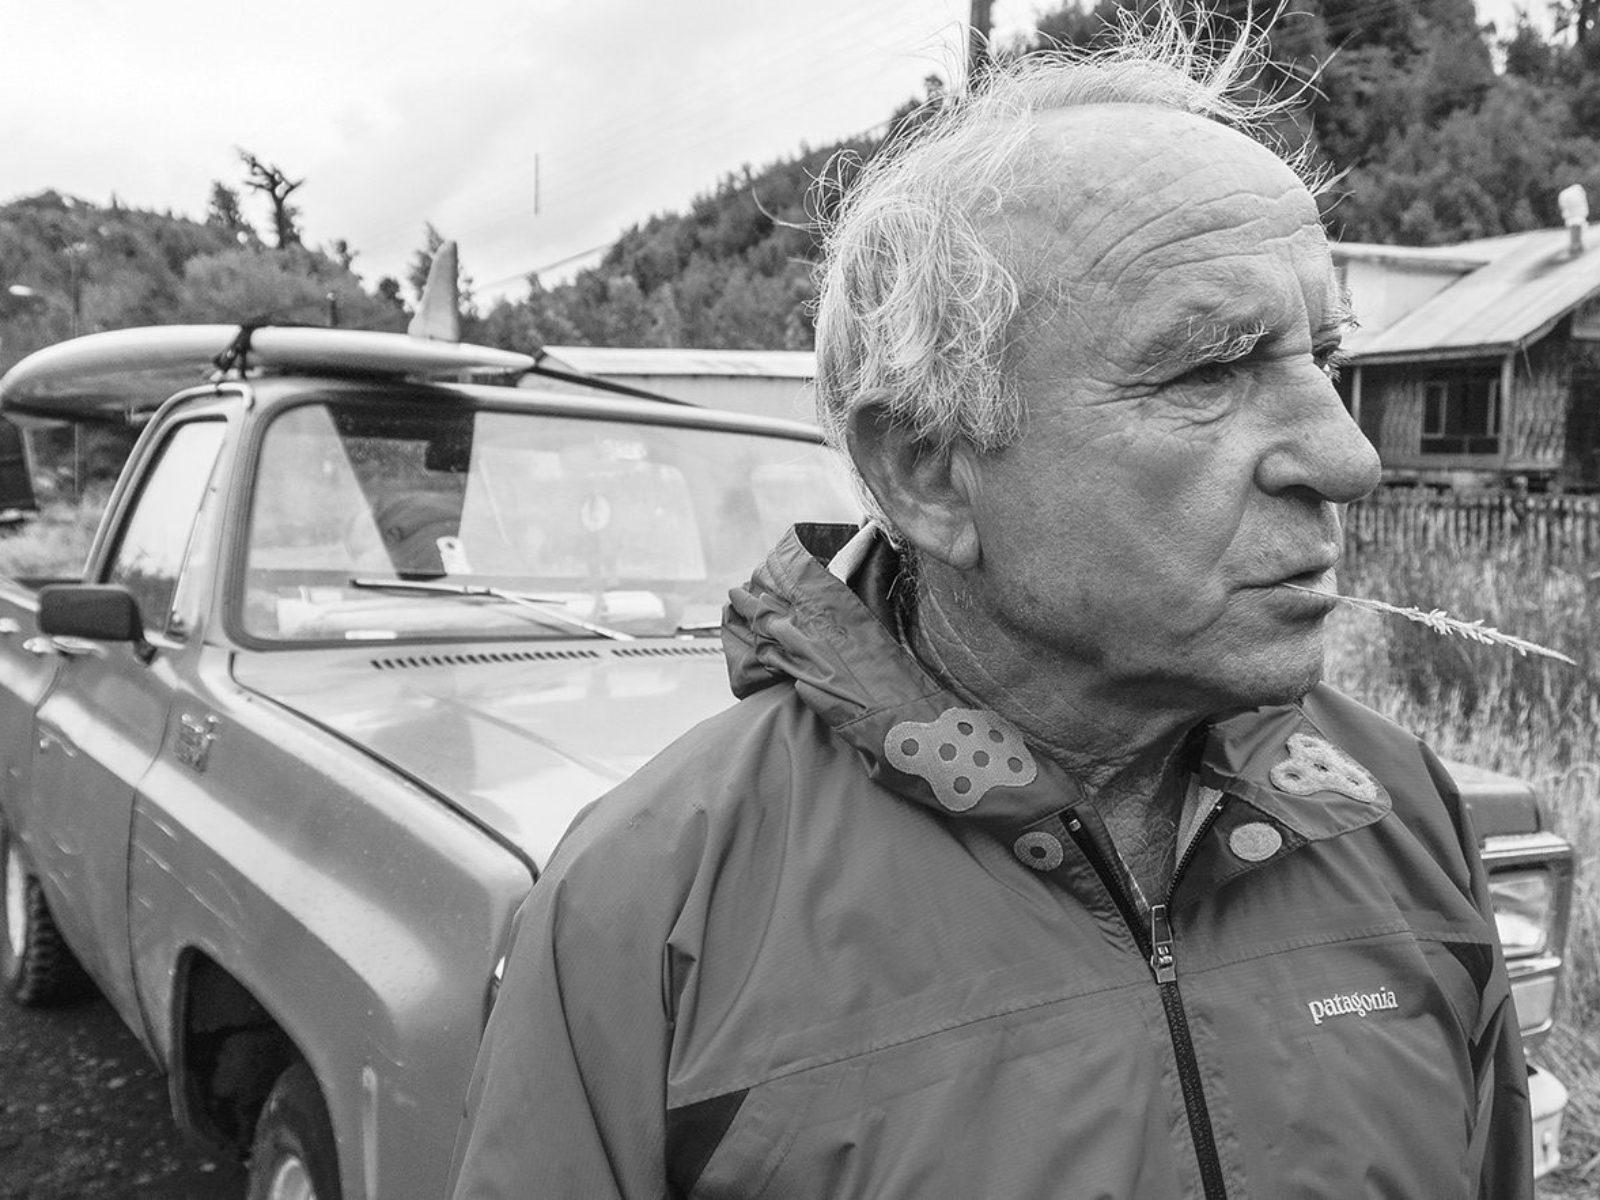 https://www.patagonia.jp/blog/wp-content/uploads/2019/03/chin_j_0169_cc_1600tcl-1600x883-c-default.jpg